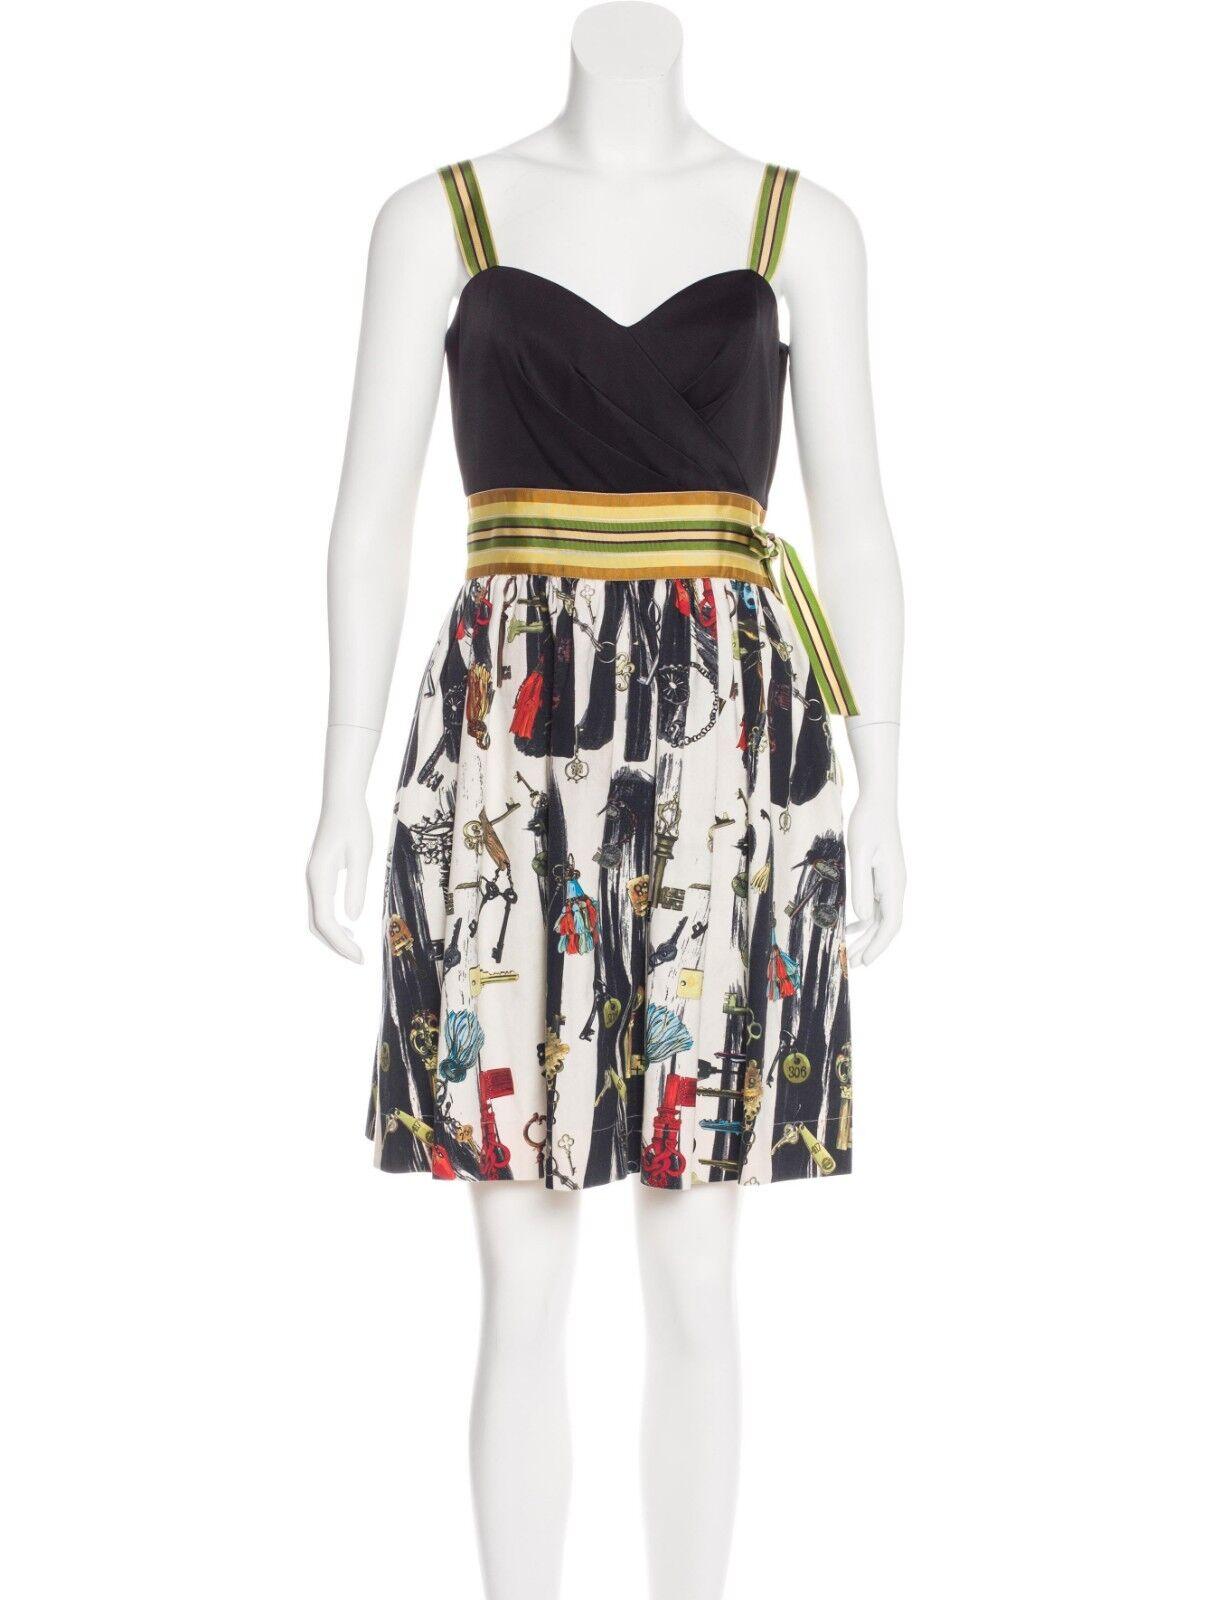 DIANE VON FURSTENBERG DVF  Caran Ribbon Trim Mixed Keys Dress Größe 6